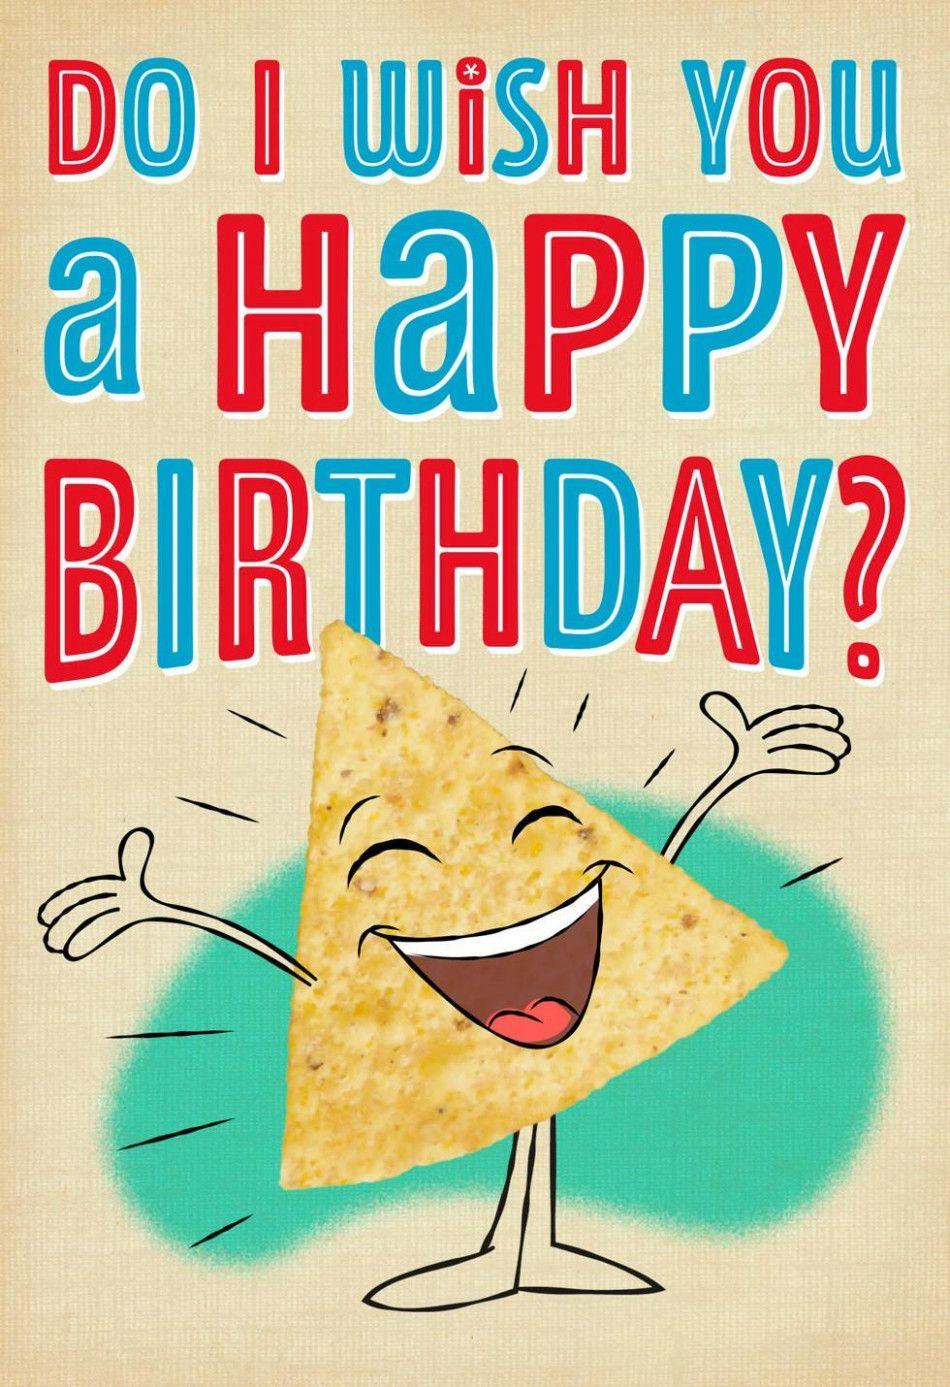 9 New Ideas Free Printable Hallmark Birthday Cards In 2021 Hallmark Birthday Card Birthday Cards For Mom Funny Birthday Cards